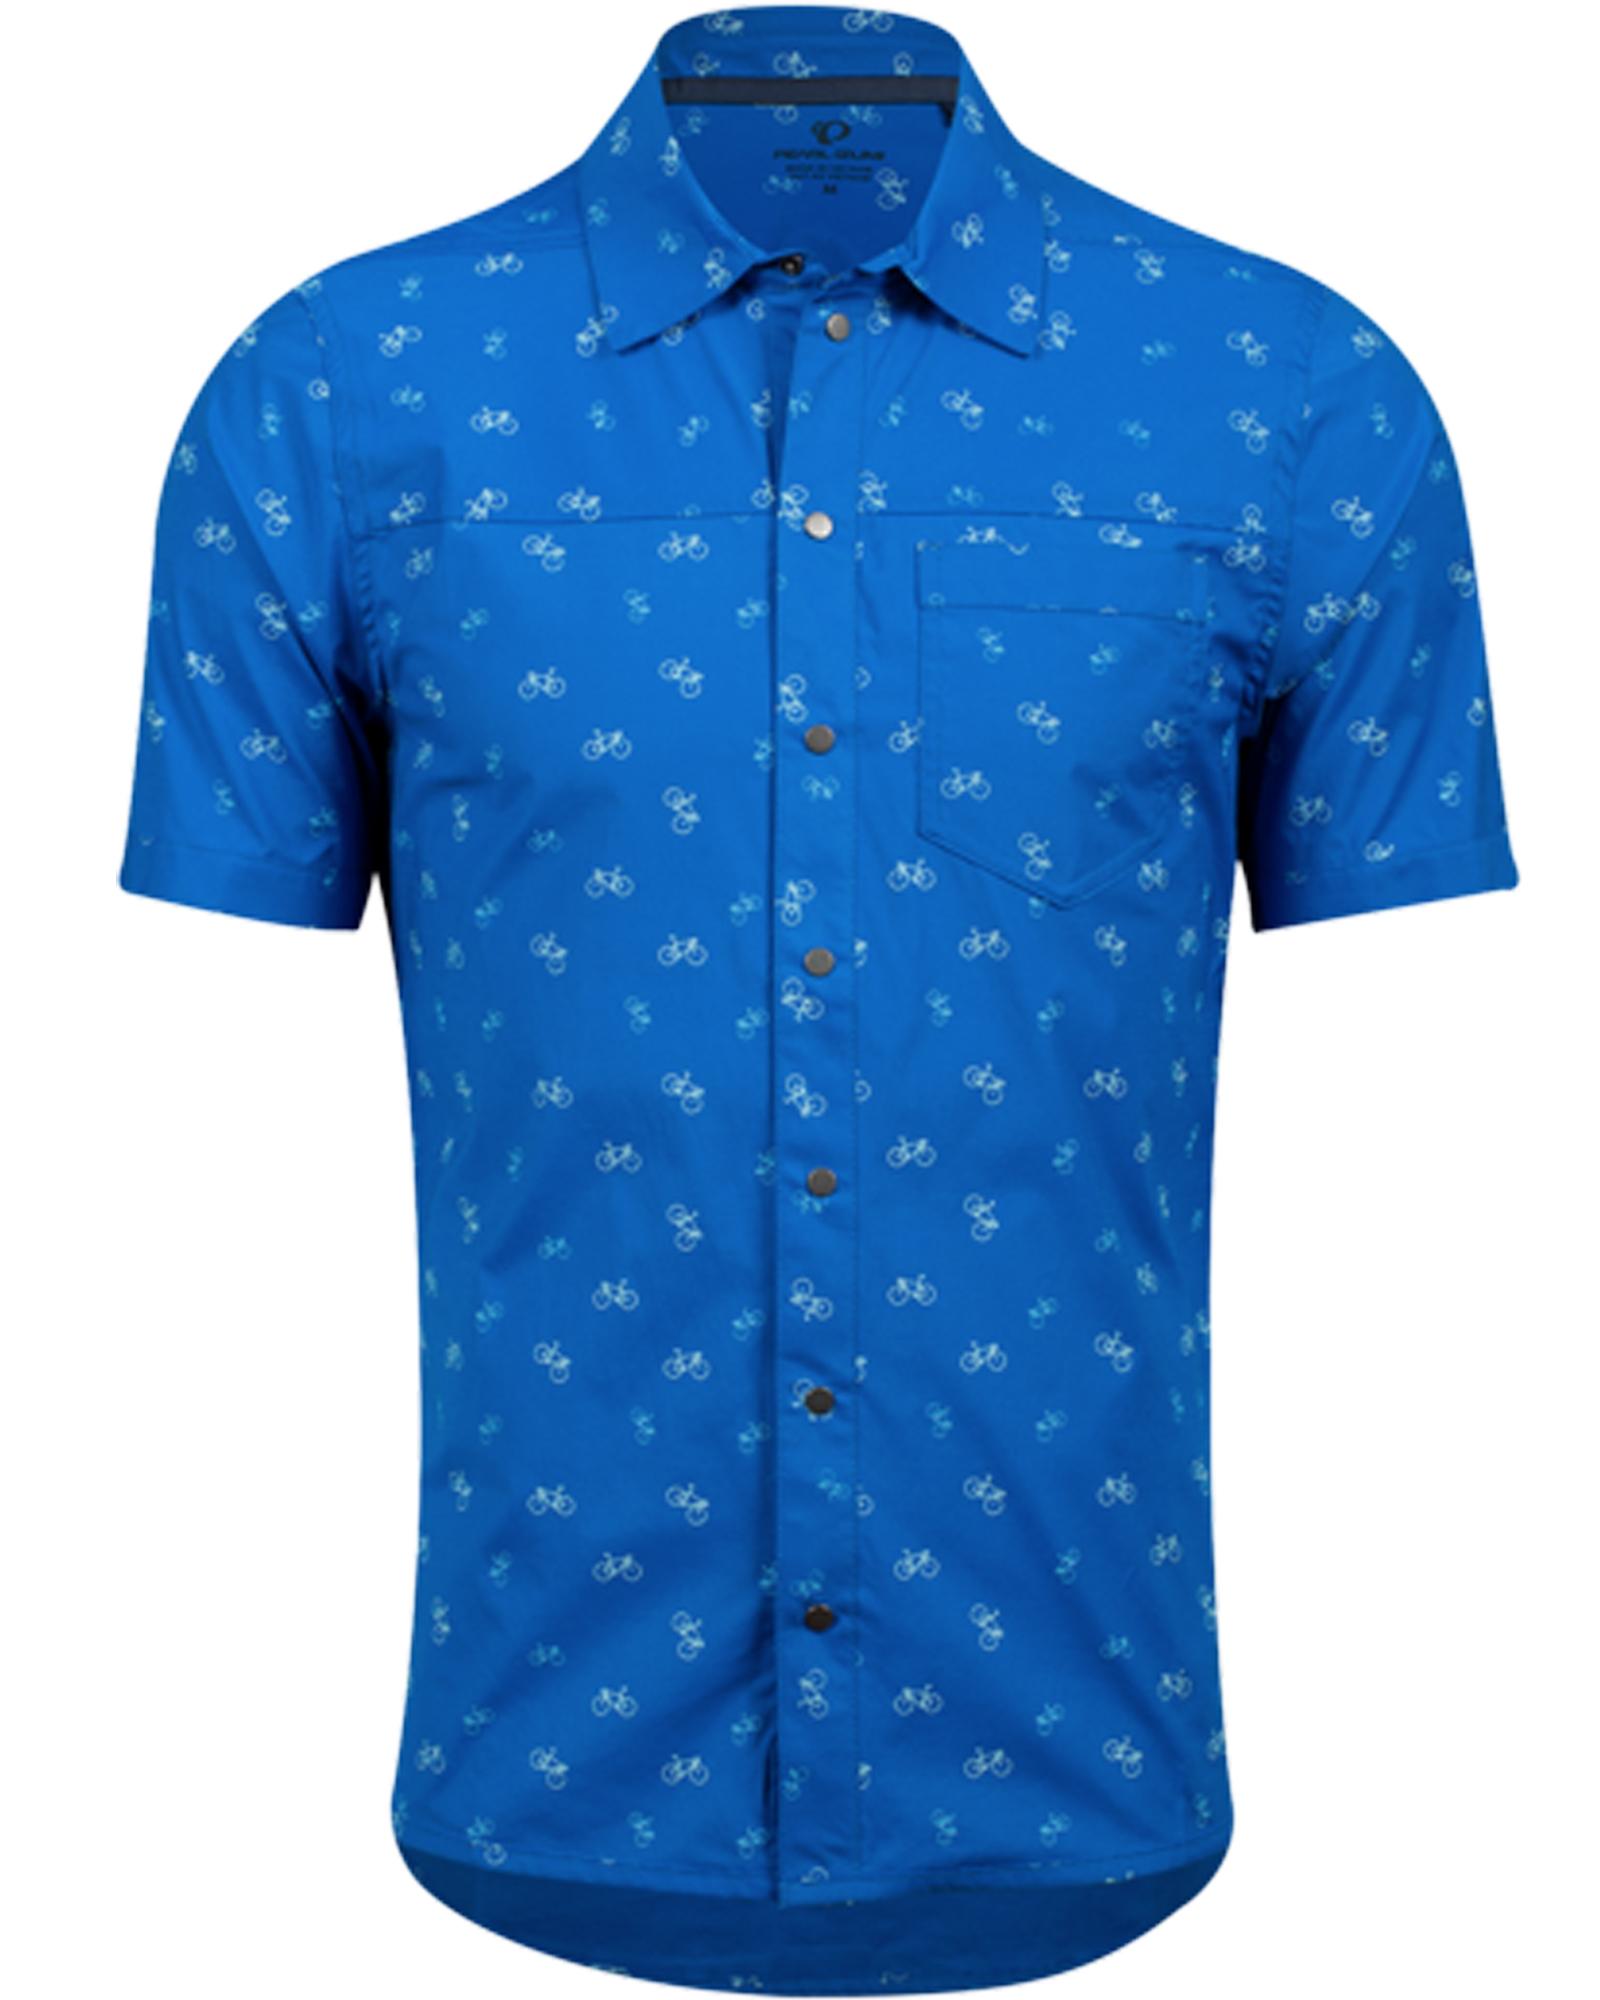 Pearl Izumi | Rove Shirt Men's | Size Medium in Lapis Bike Rack